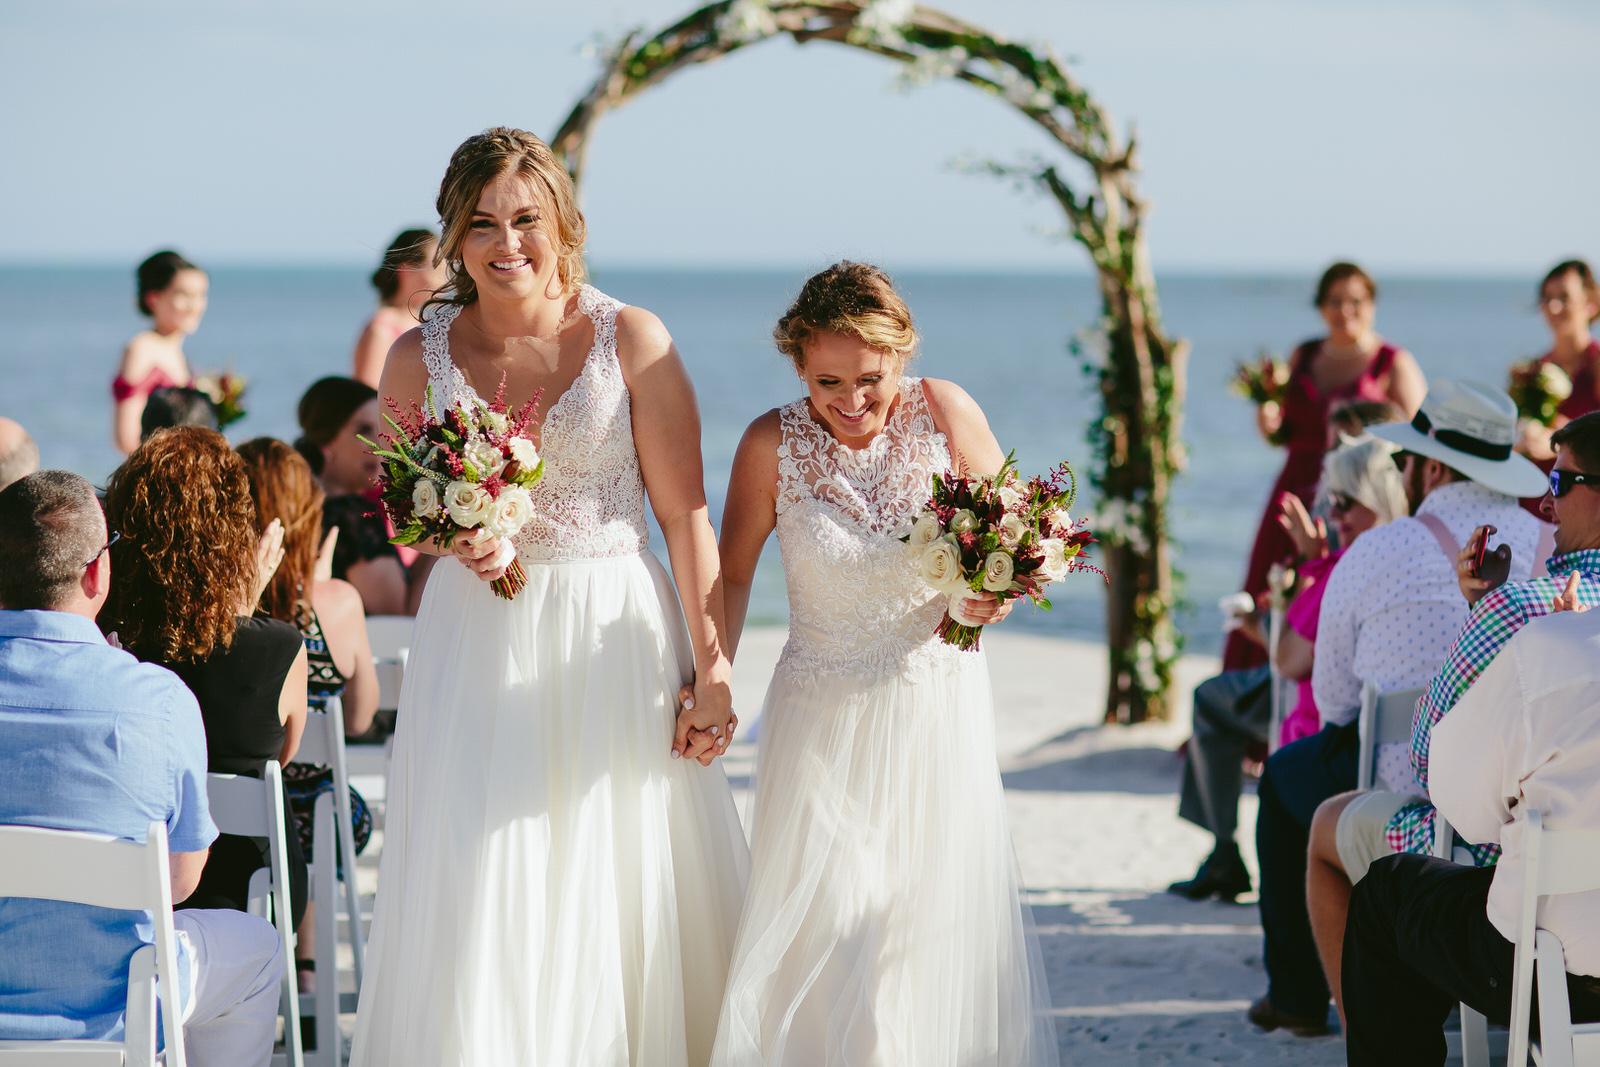 destination_wedding_photographer_tiny_house_photo_gay_weddings.jpg